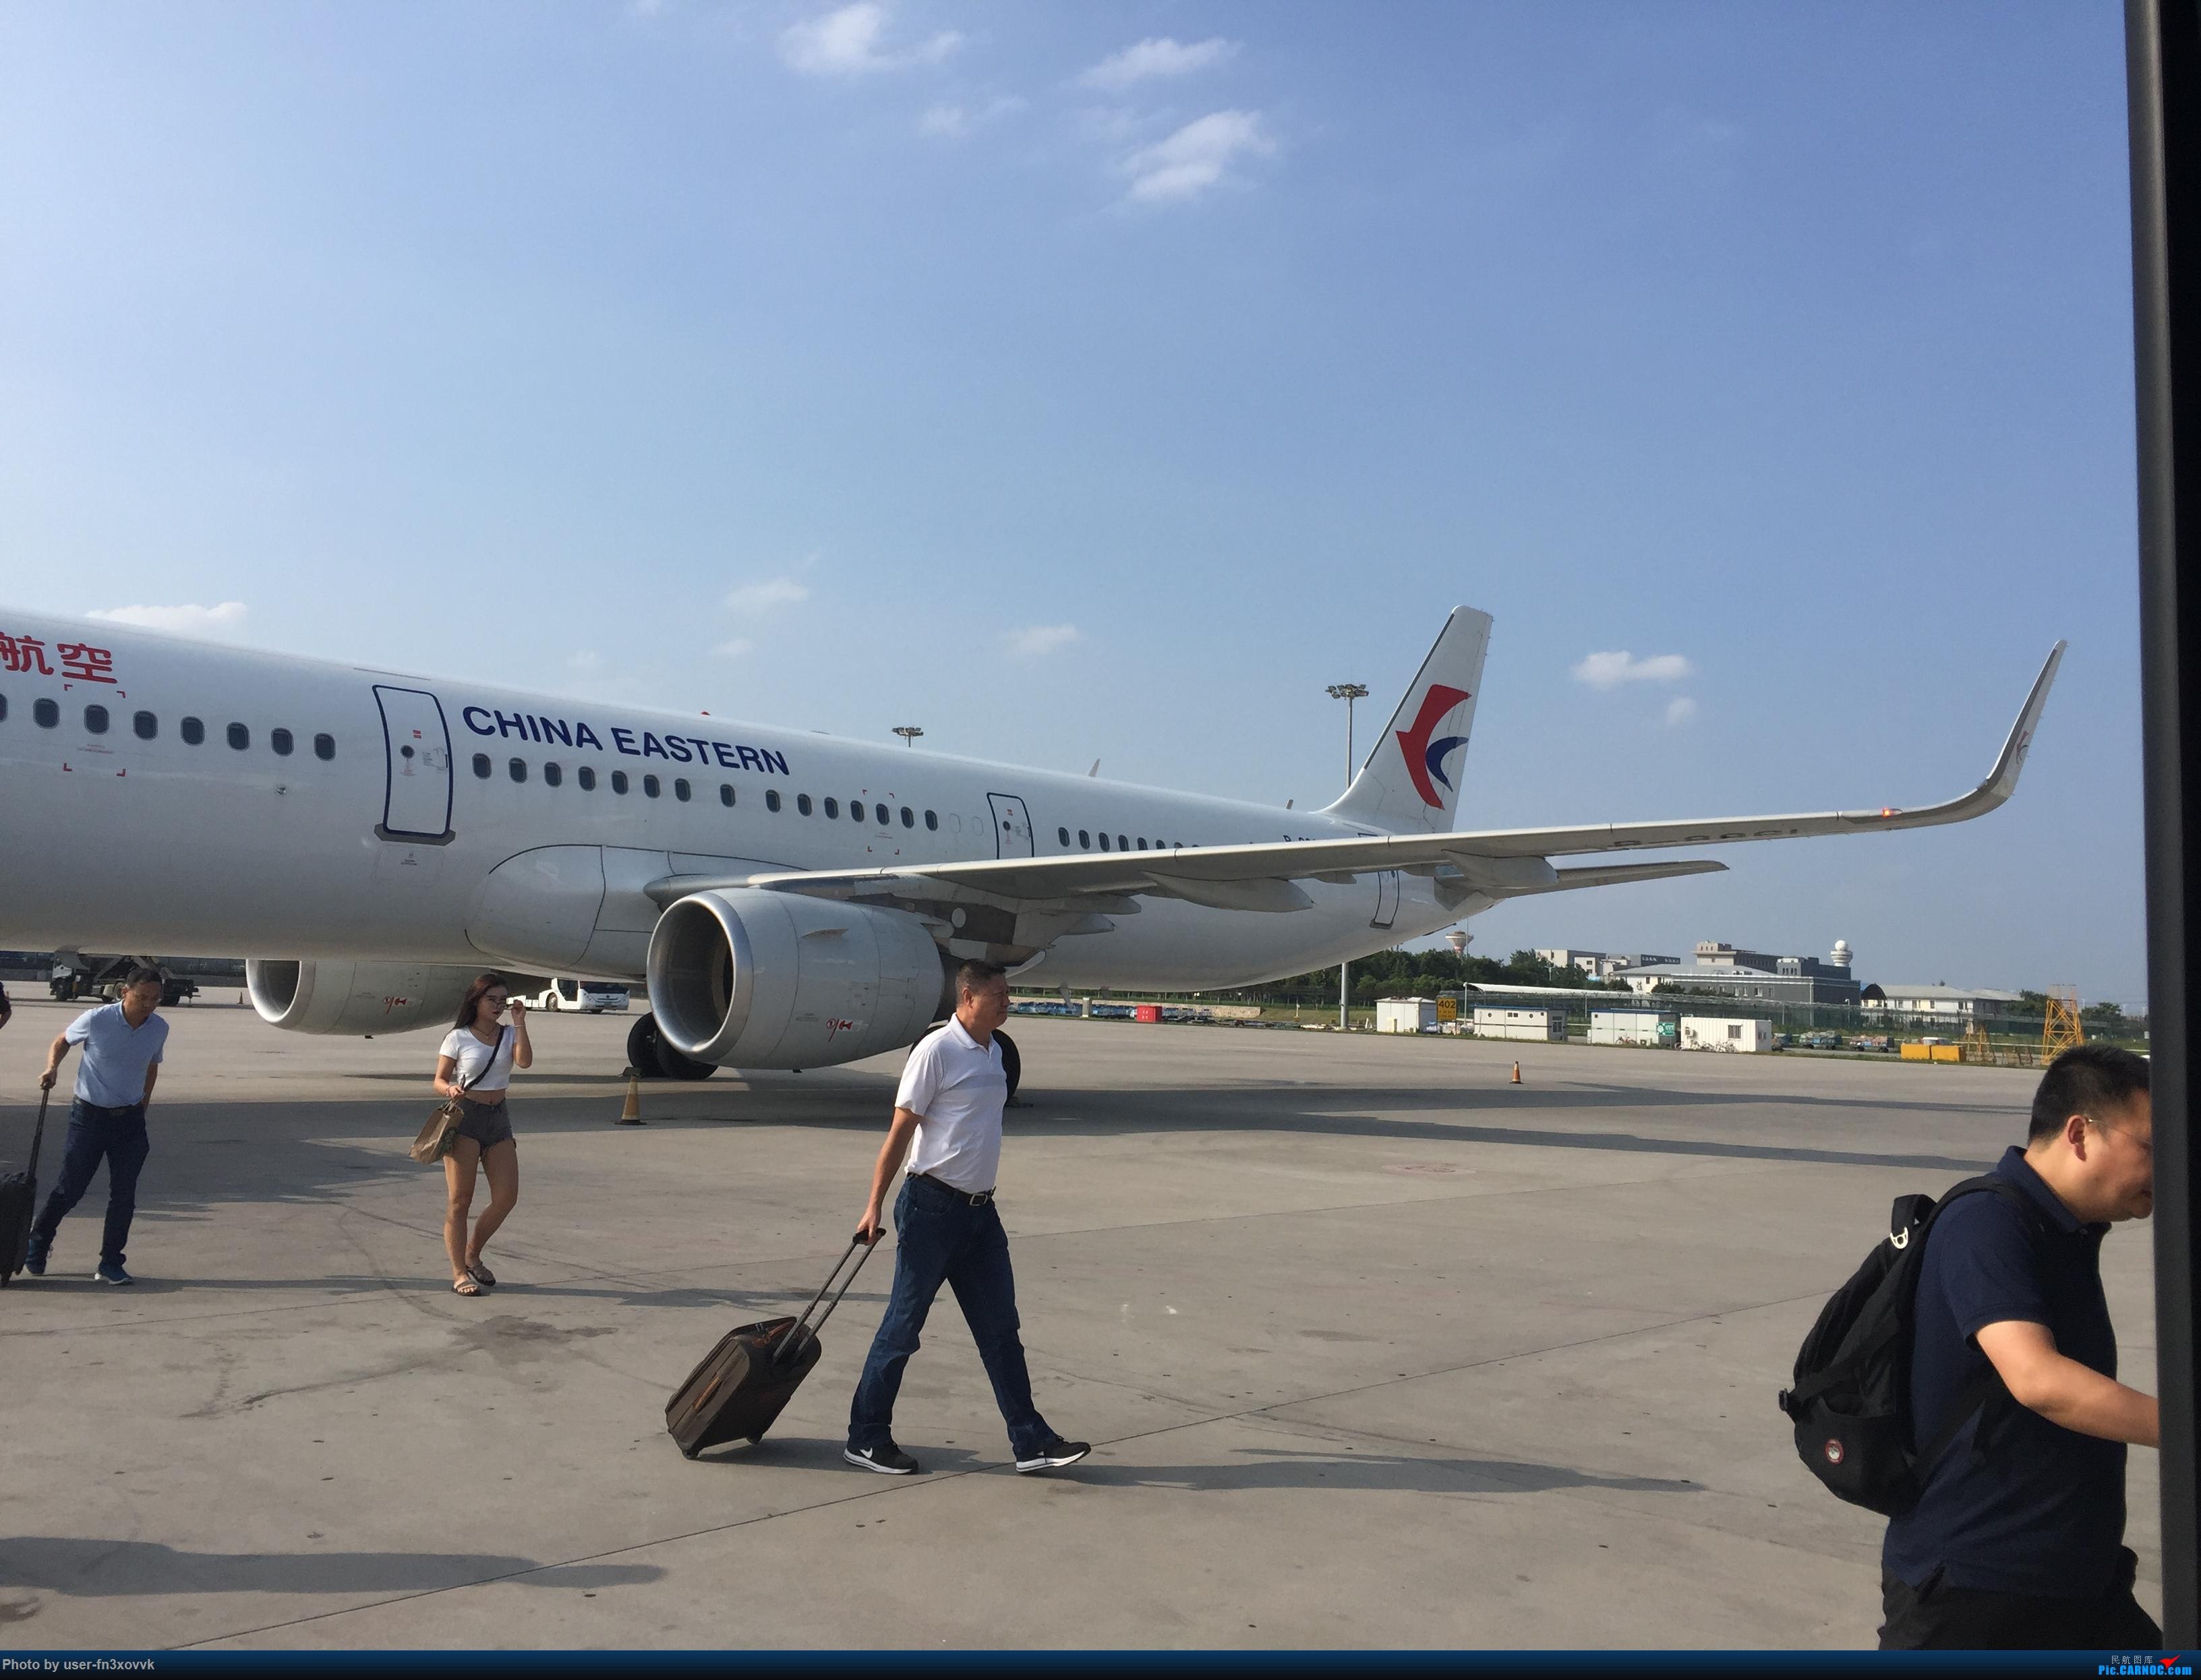 Re:[原创]【user-fn3xowk的游记】第二季第一集 MU2112&MU9641解锁新机型A319及深夜航班(续集) AIRBUS A321NEO  XIY